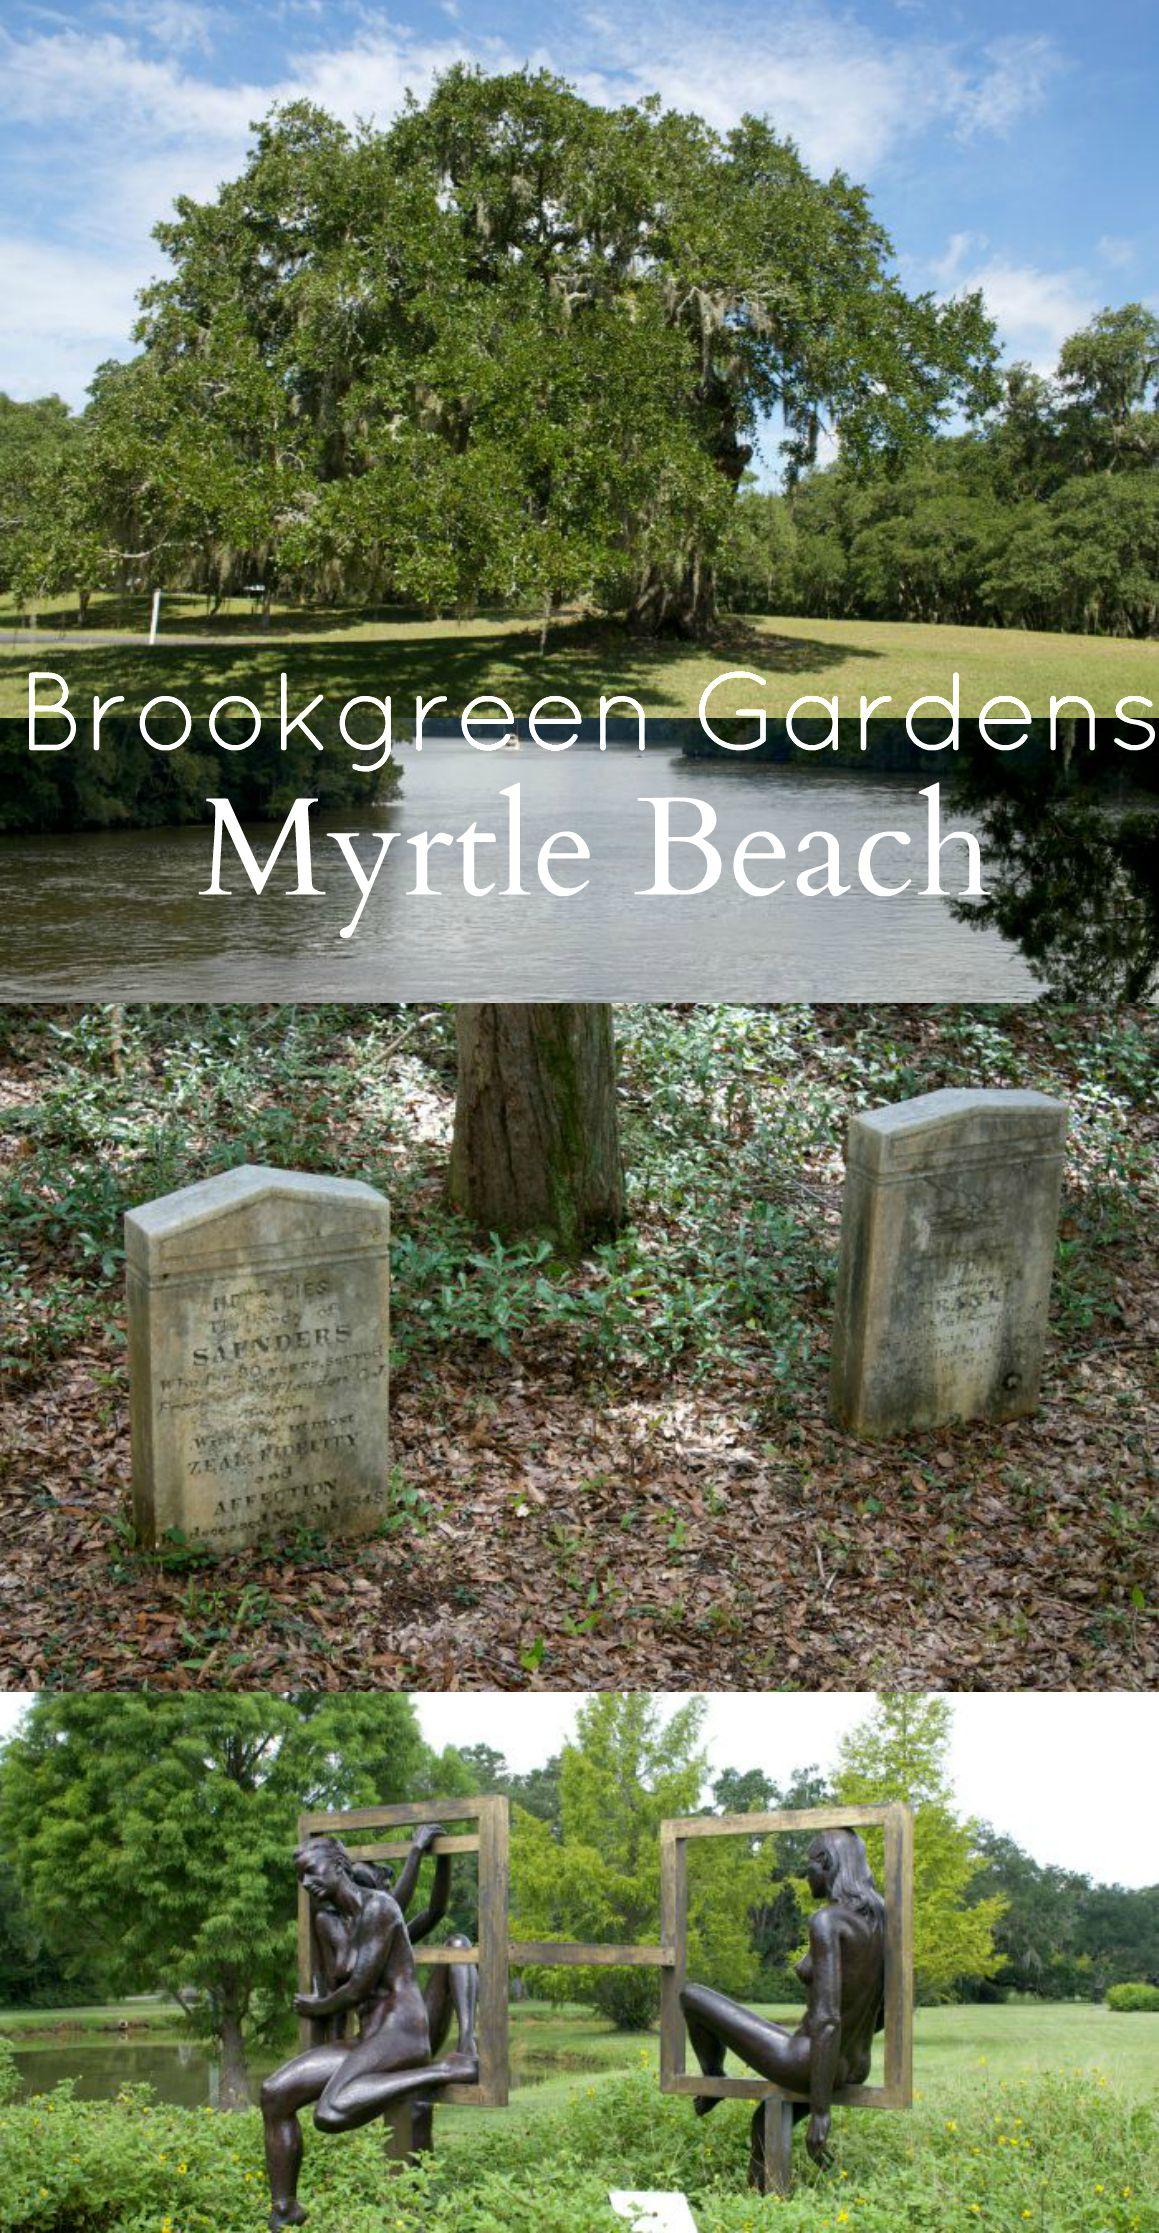 Myrtle beach attractions brookgreen gardens for Brookgreen gardens south carolina